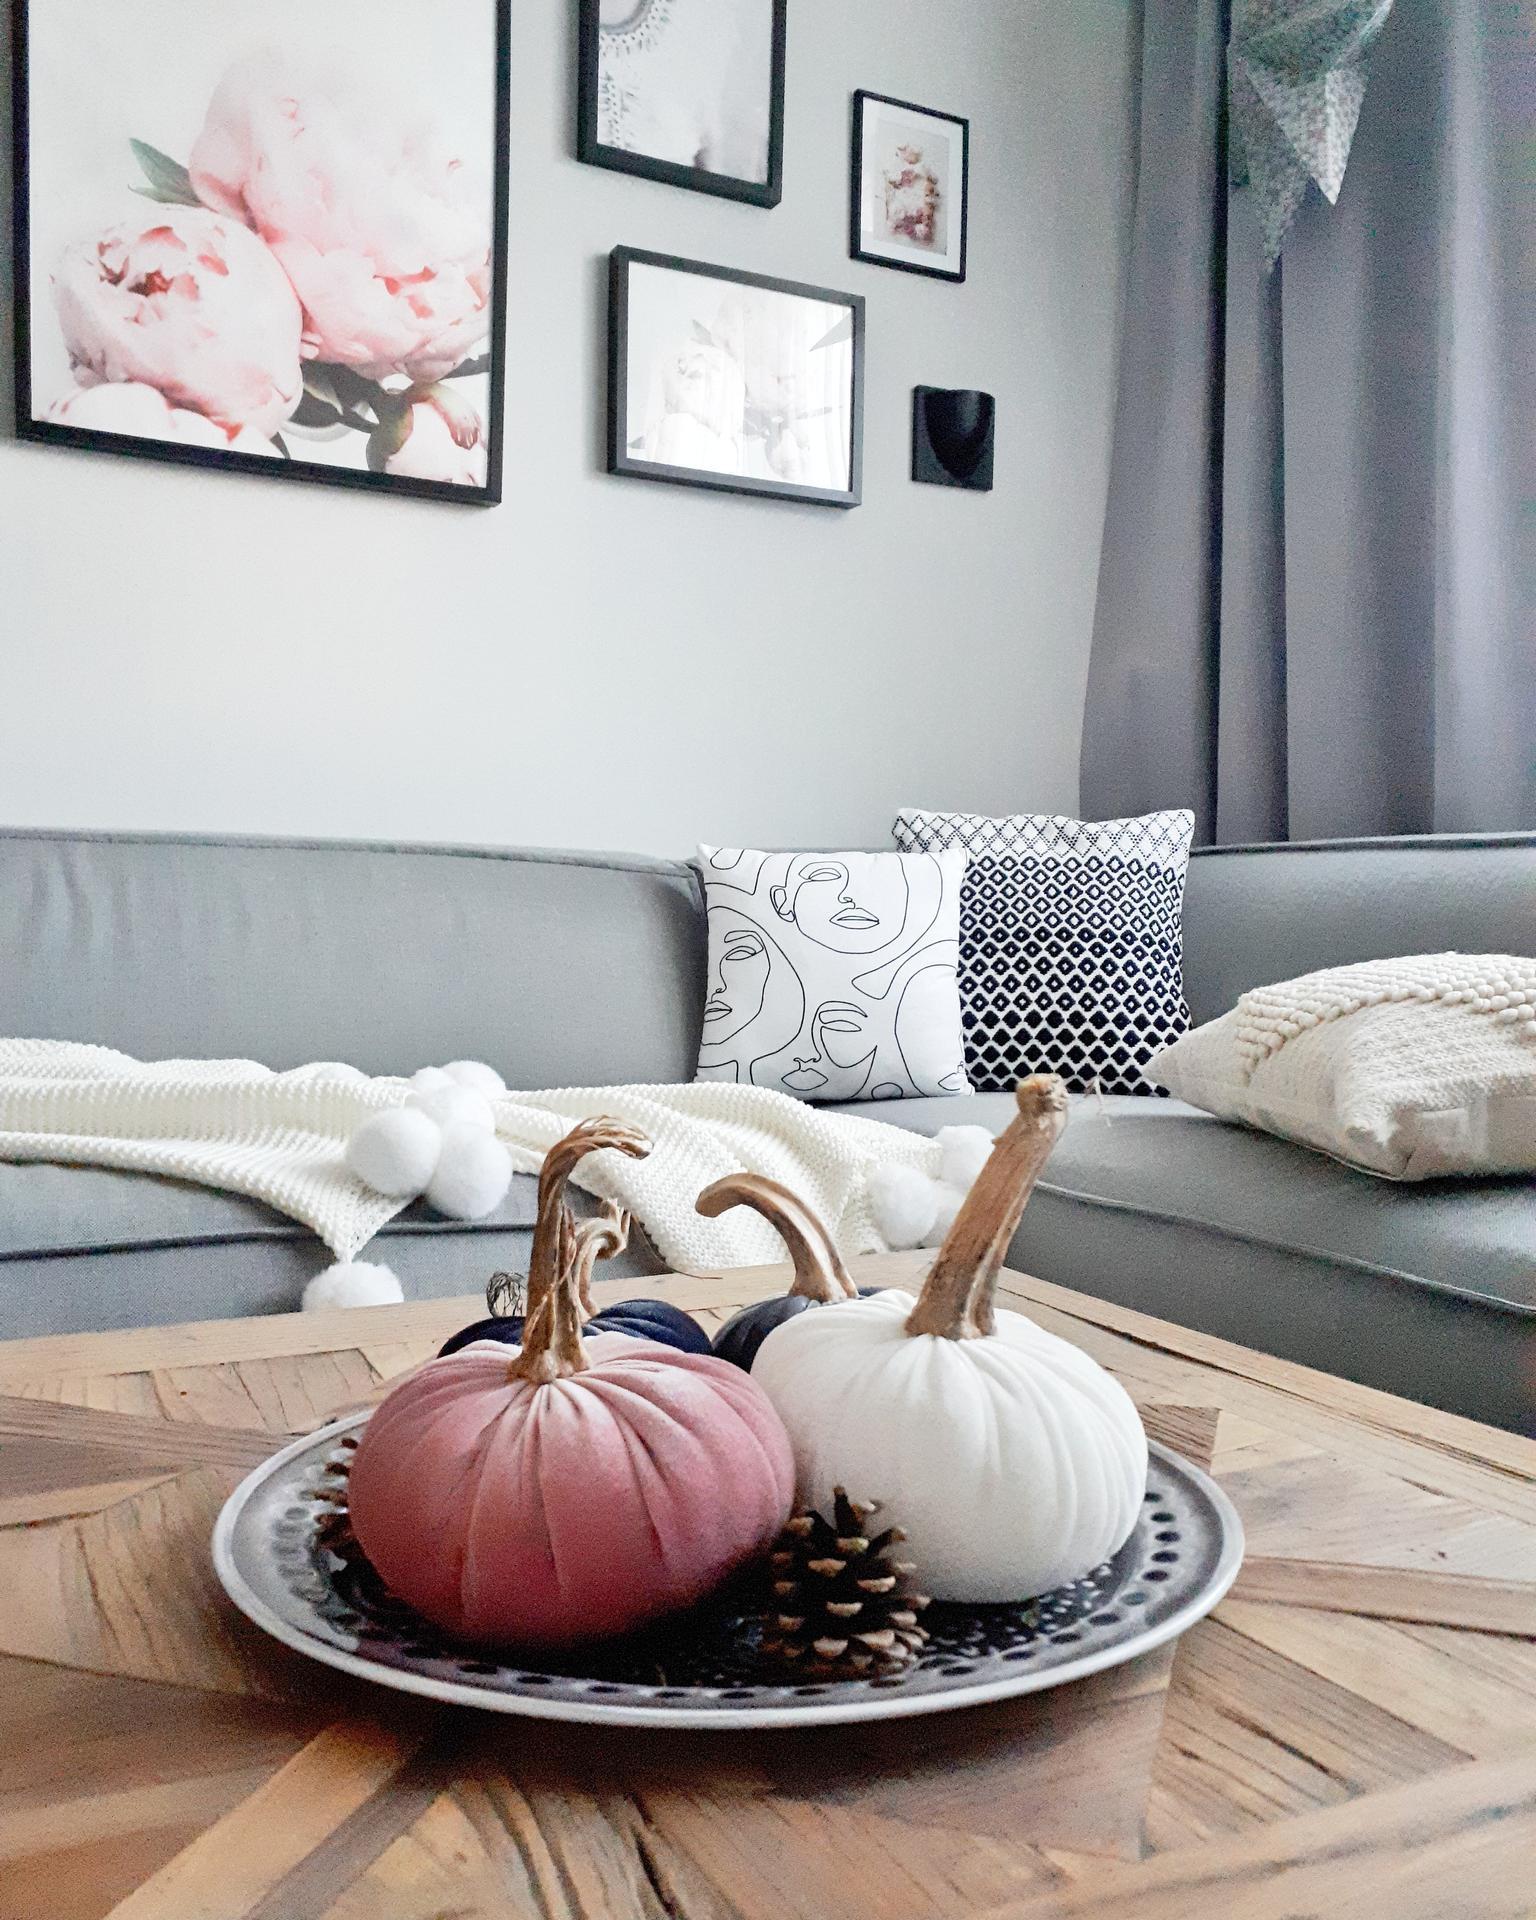 Jeseň u nás doma - Obrázok č. 11